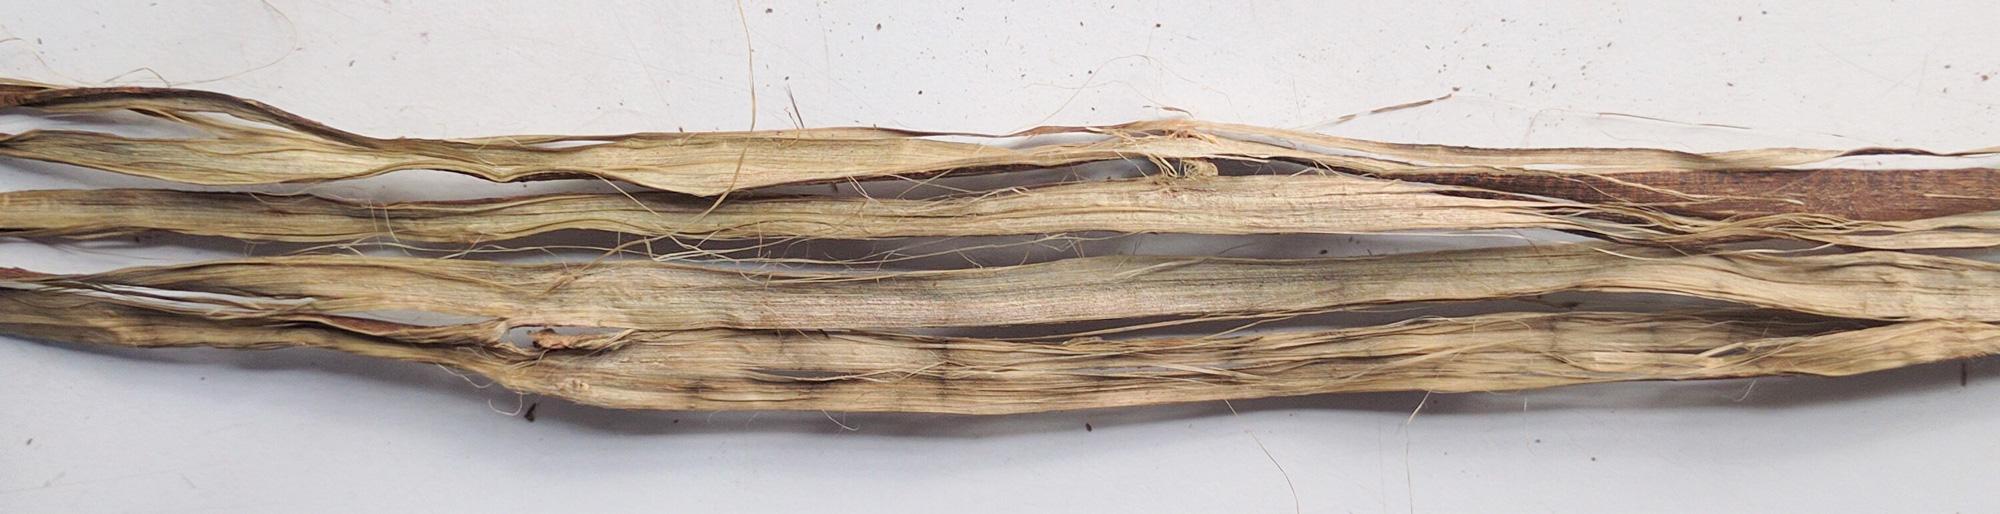 Close up of bark ribbon, fiber on the inside